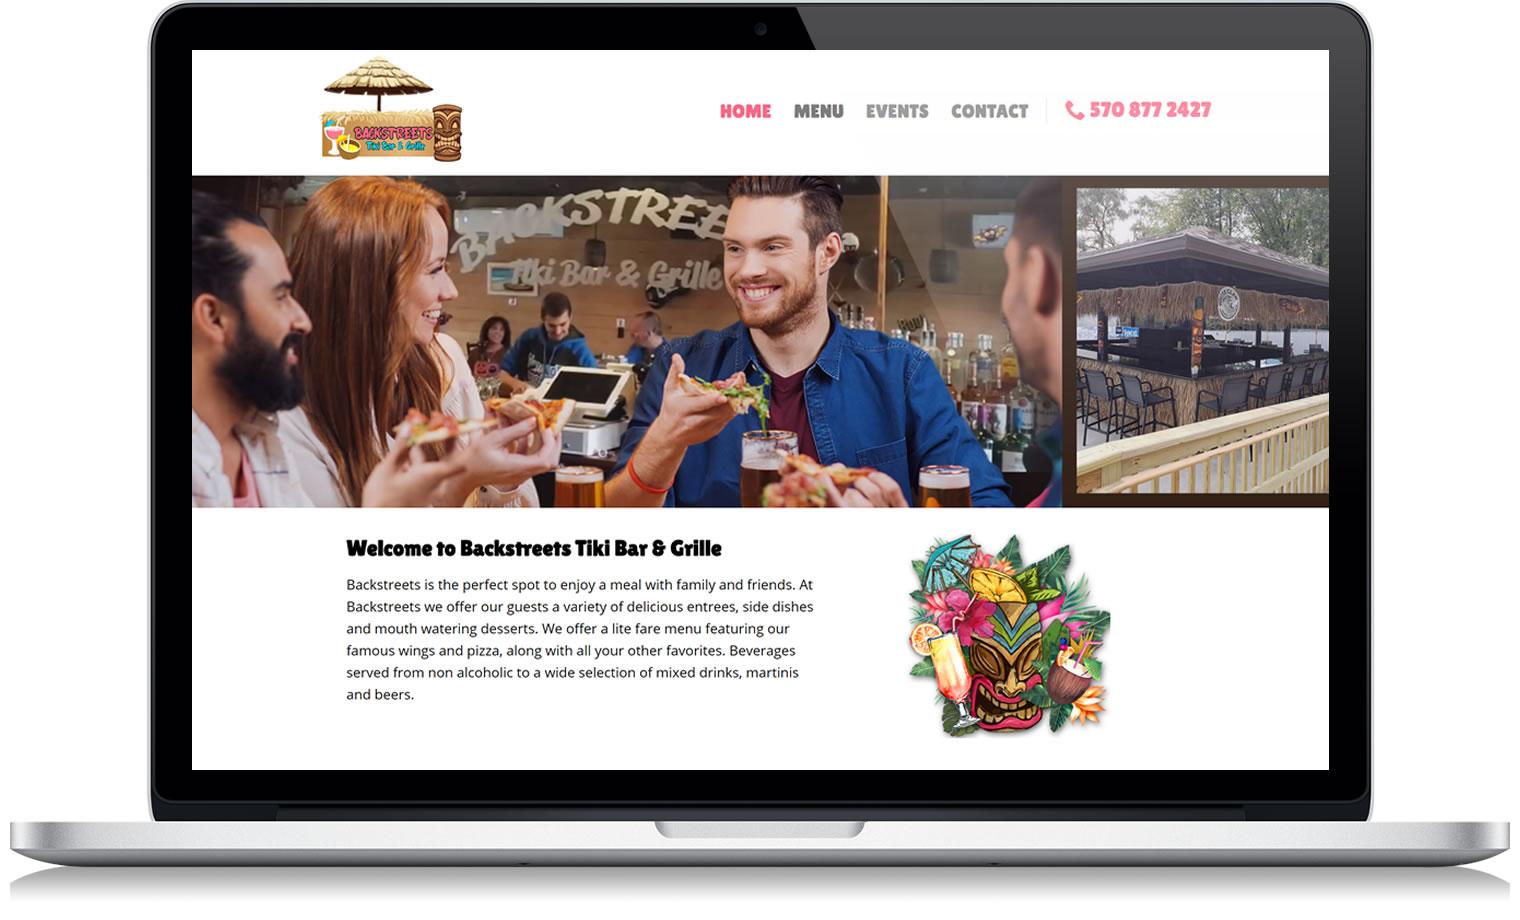 backstreets website